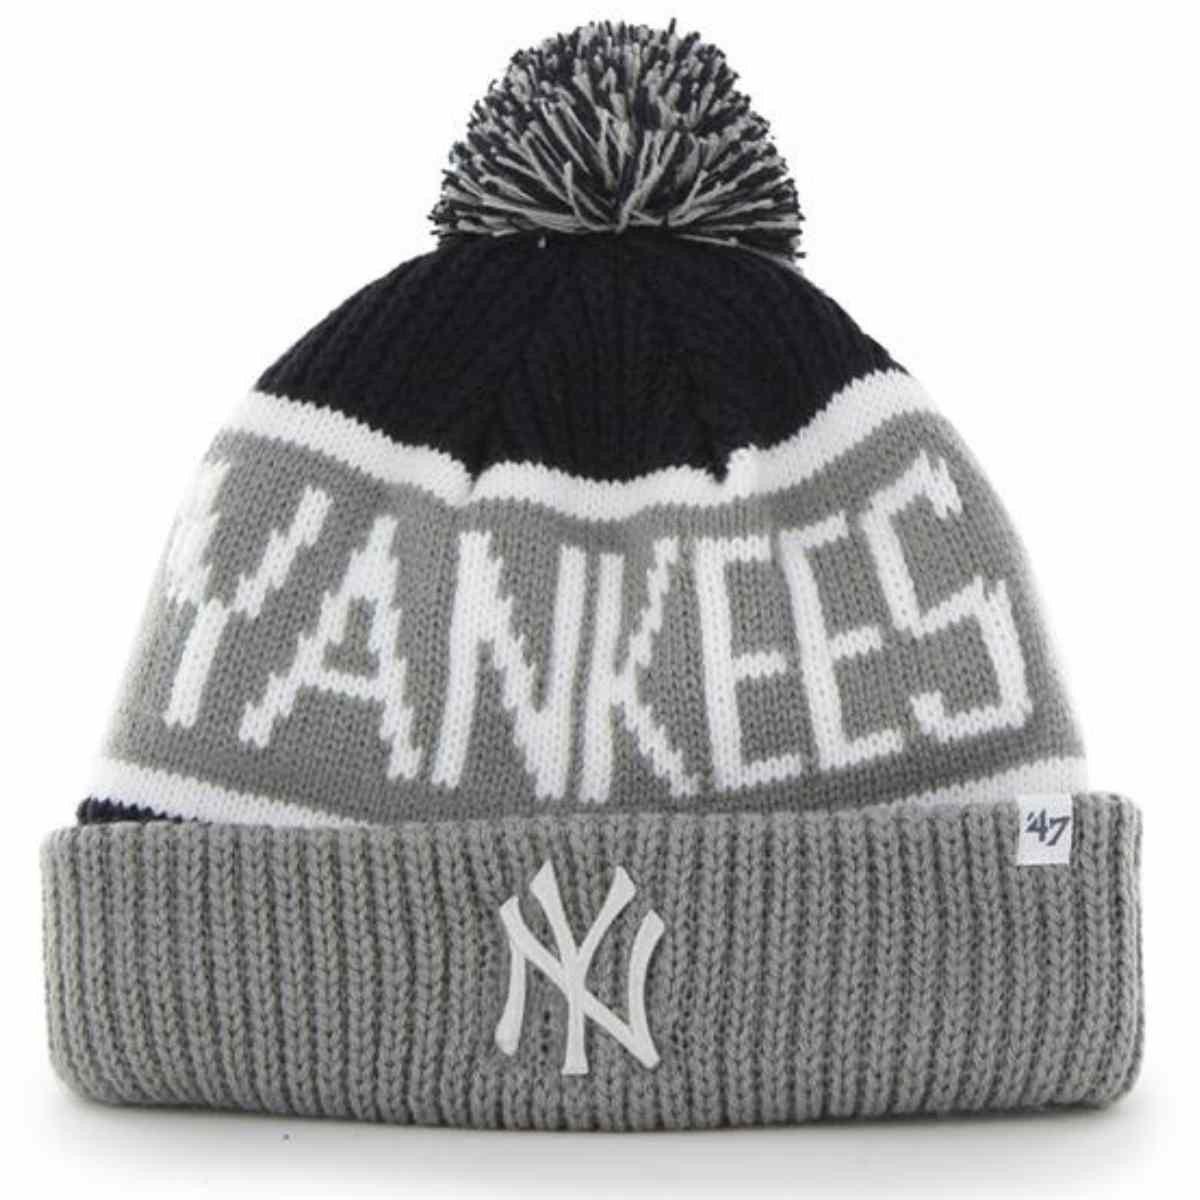 9d11d441339 New York Yankees 47 Brand Gray Navy Calgary Knit Cuff Beanie Cap Poofball